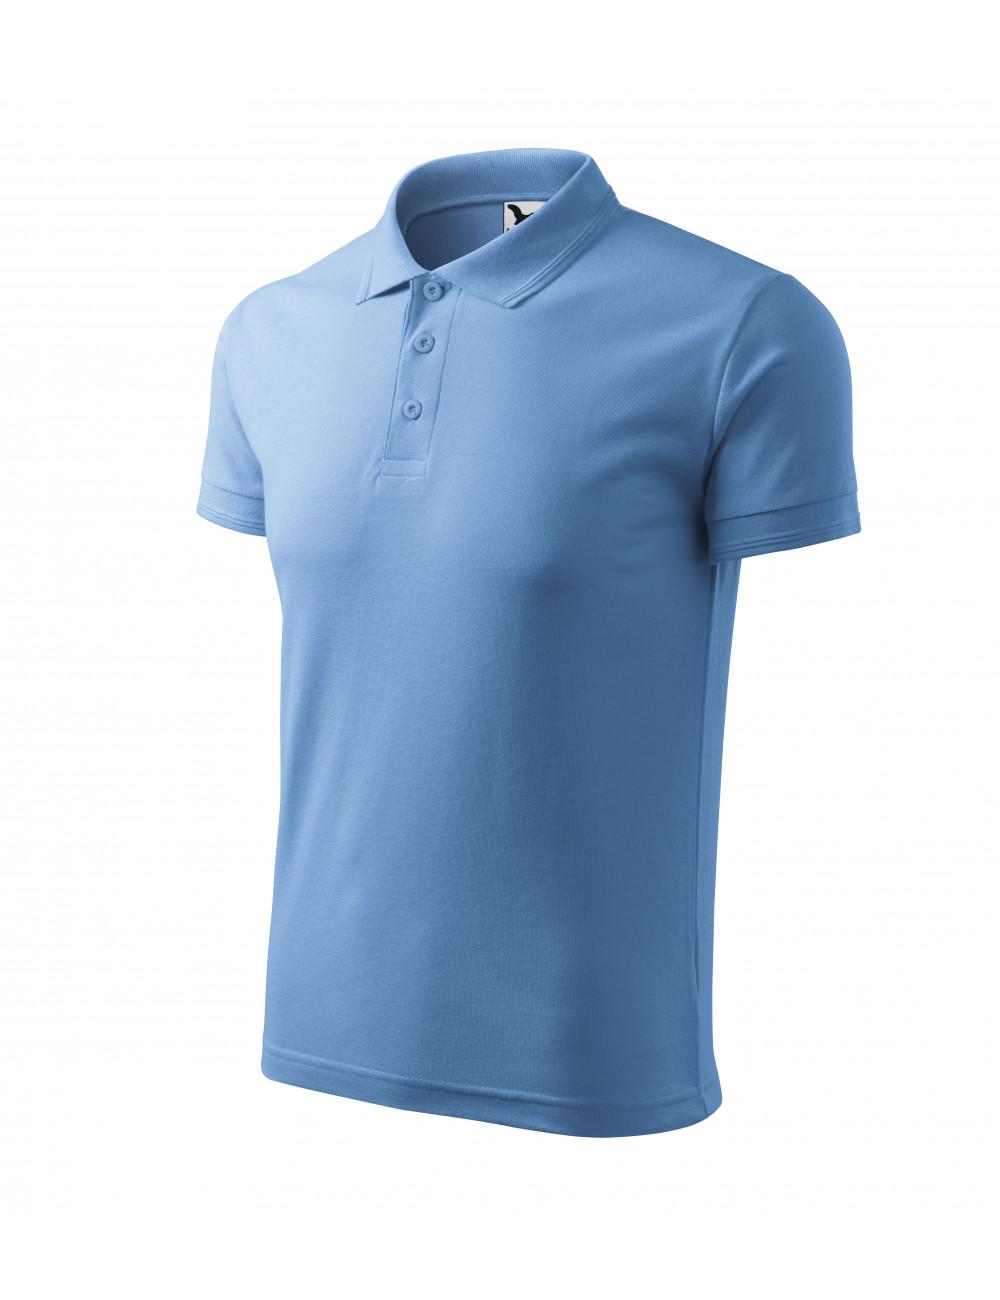 Adler MALFINI Koszulka polo męska Pique Polo 203 błękitny